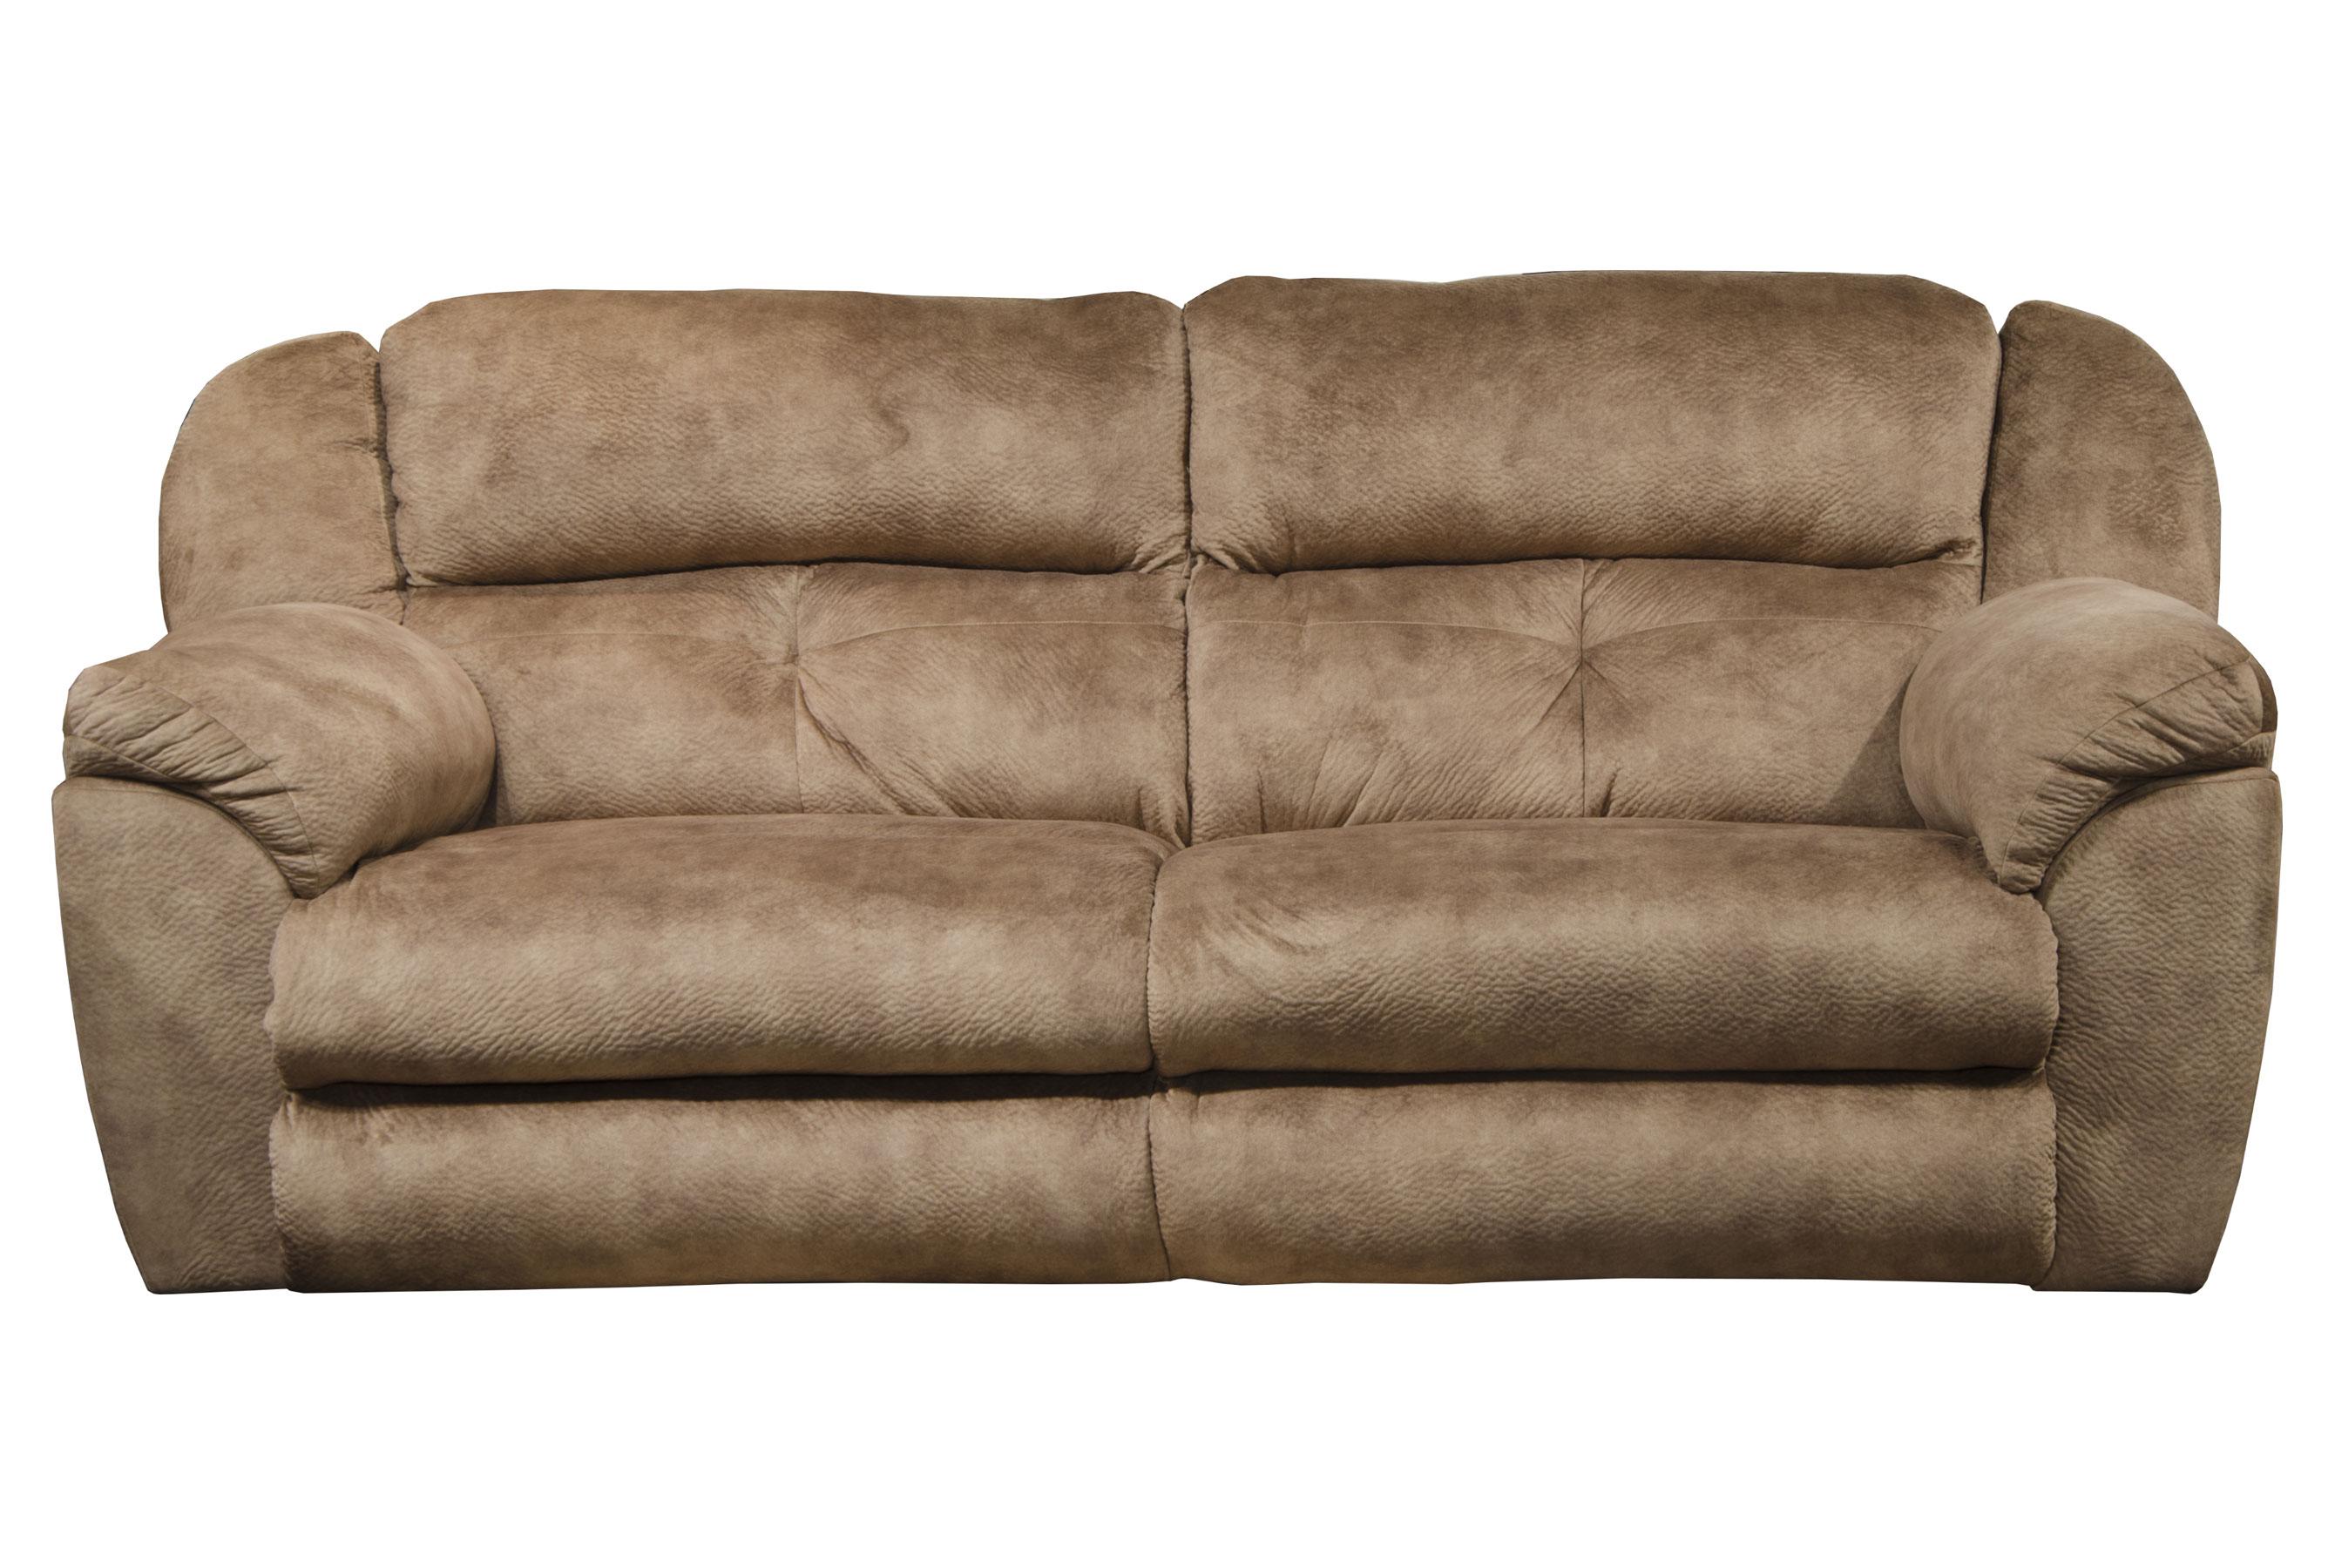 Brilliant Carrington 90 Layflat Reclining Sofa Sofas And Sectionals Short Links Chair Design For Home Short Linksinfo